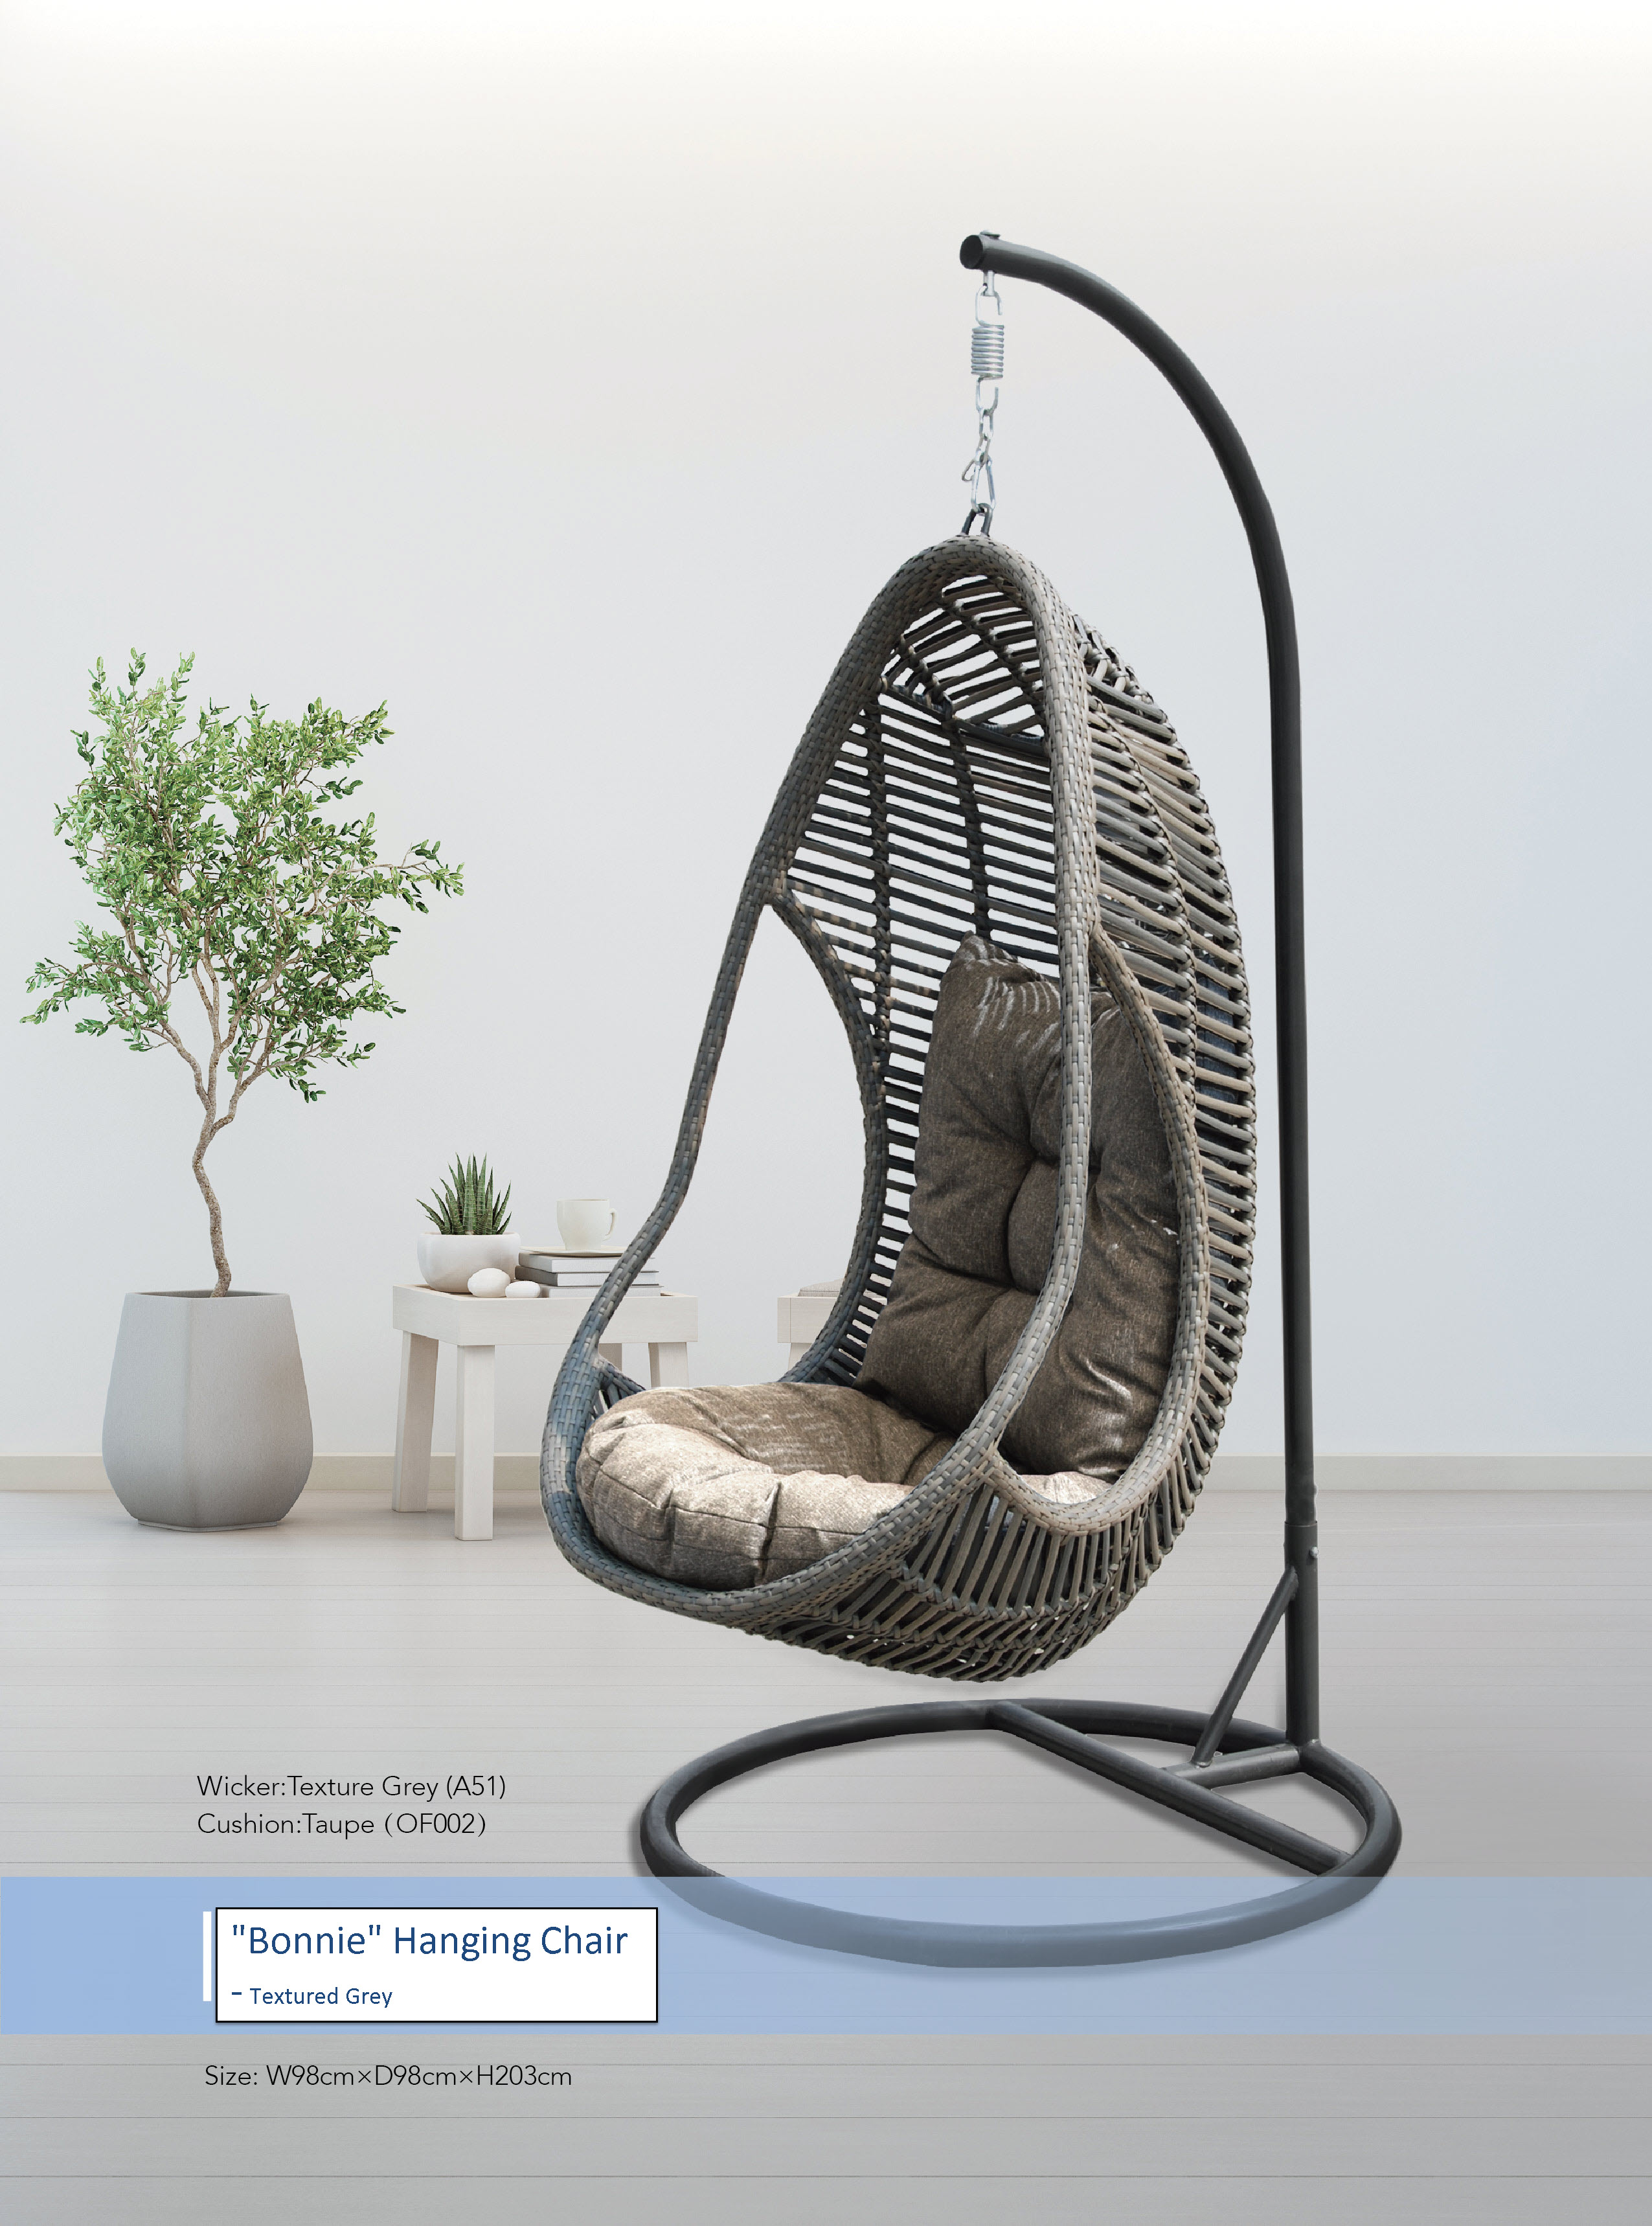 Bonnie Hanging Chair Textured Grey Cobra Cane